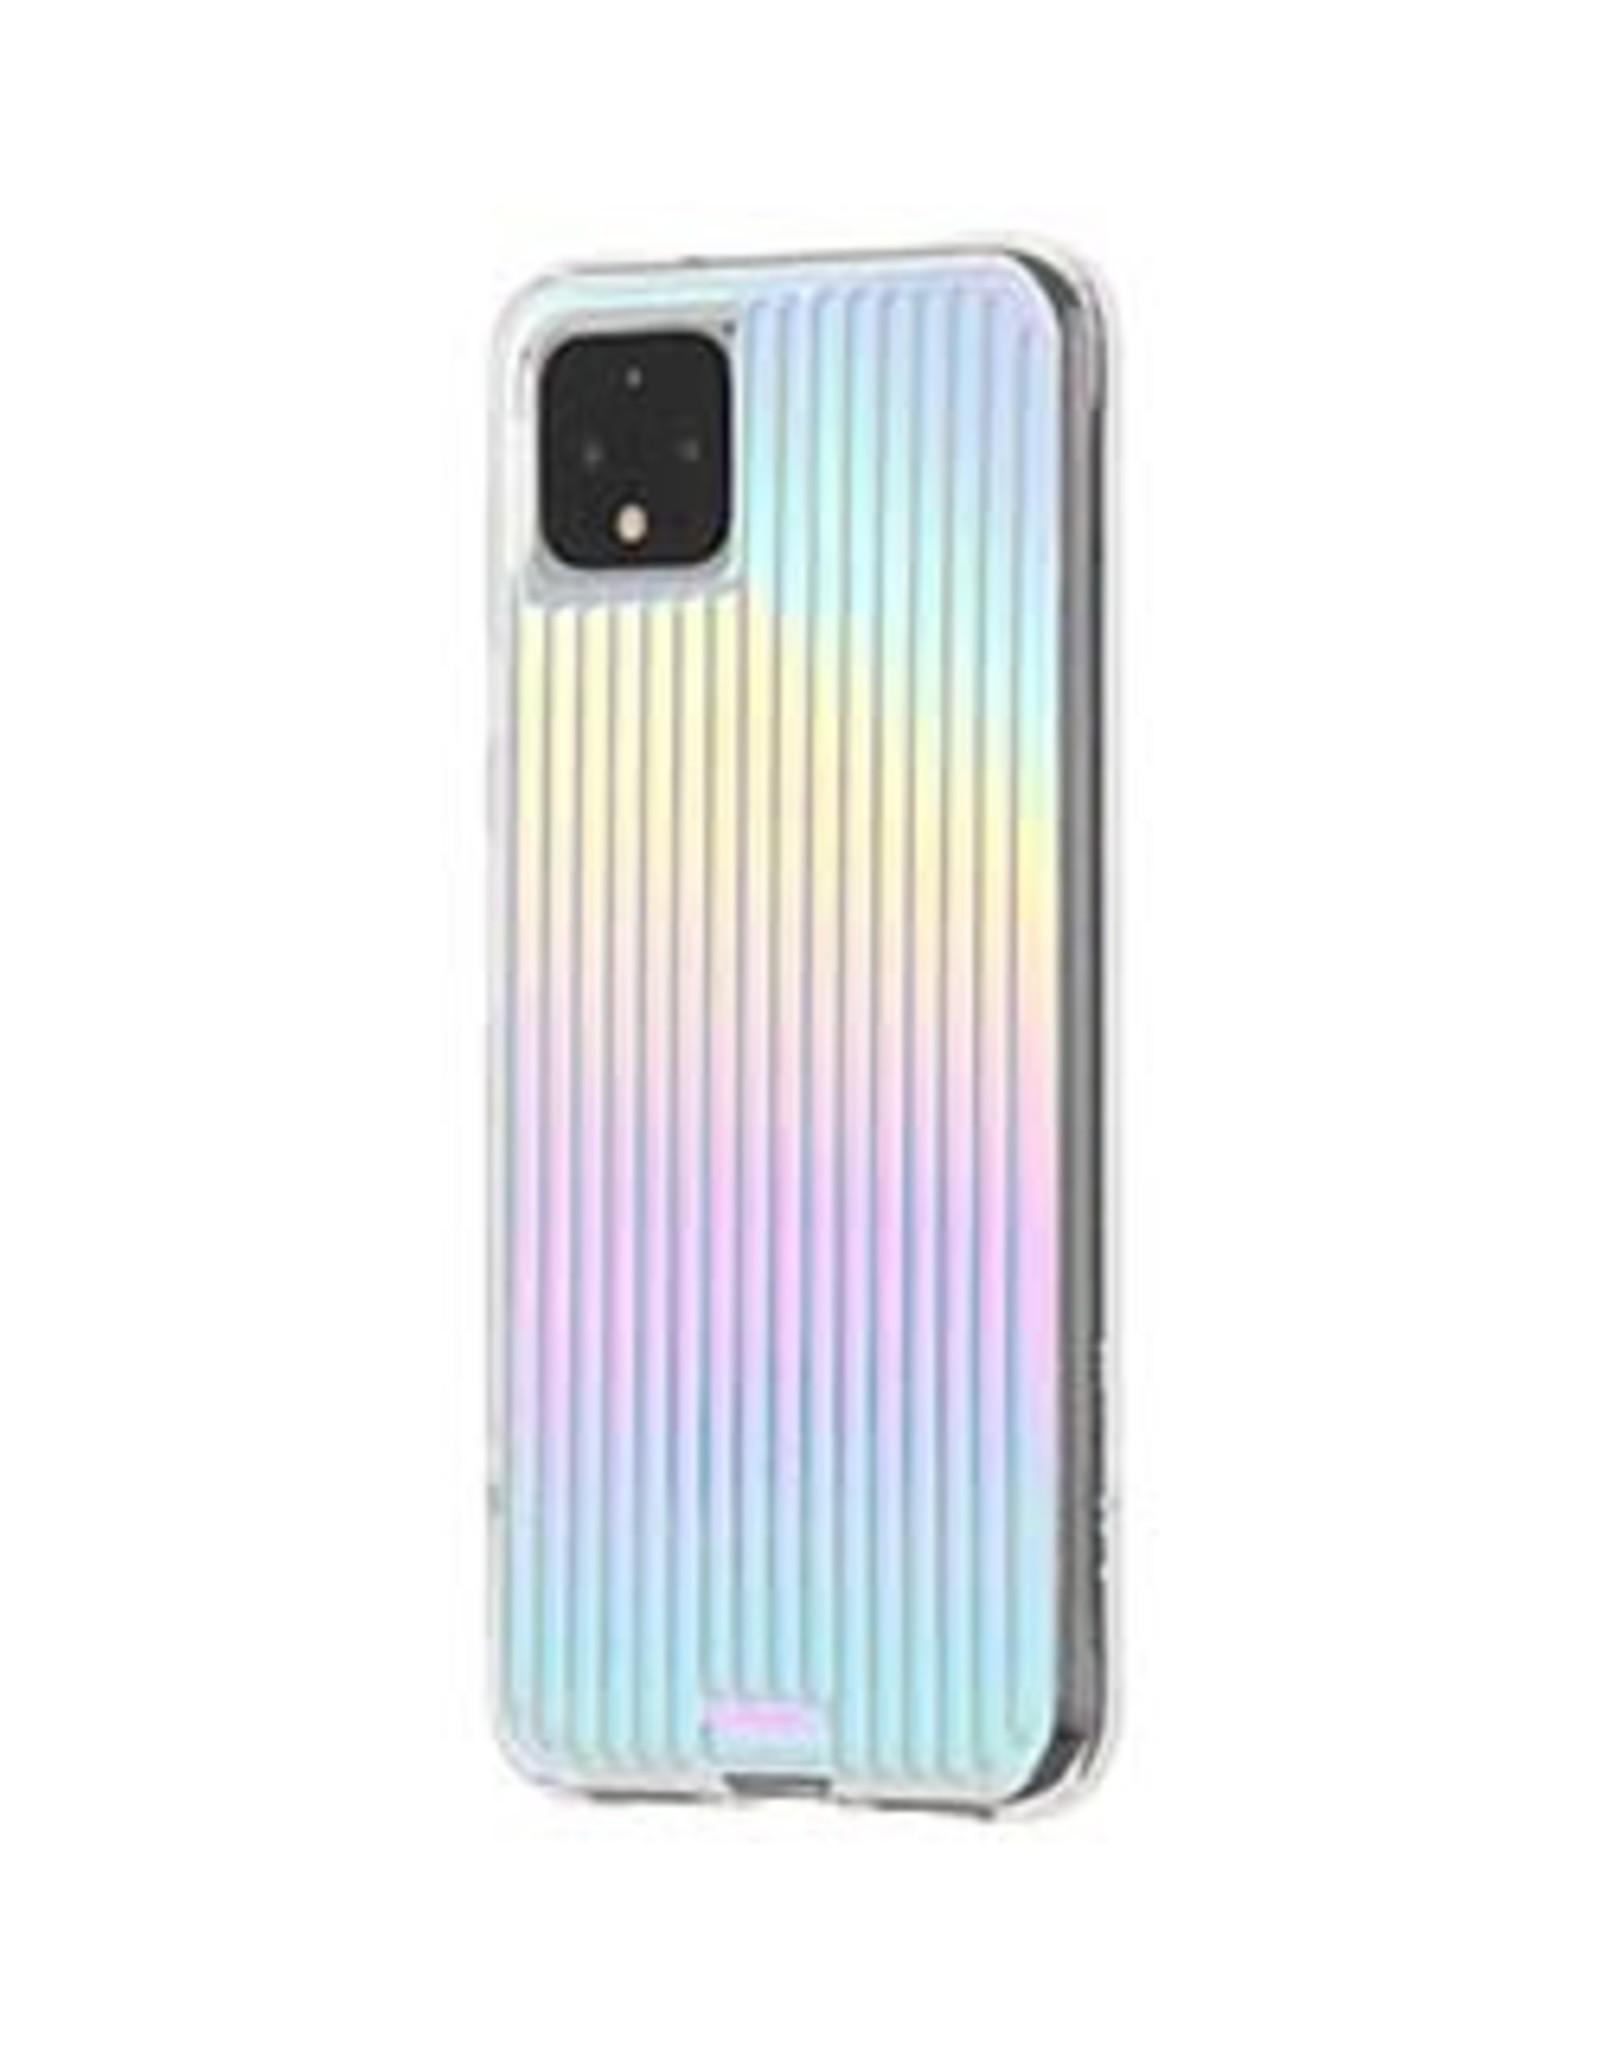 Case-Mate Case-Mate | Google Pixel 4 XL Iridescent Tough Groove Case 15-06338